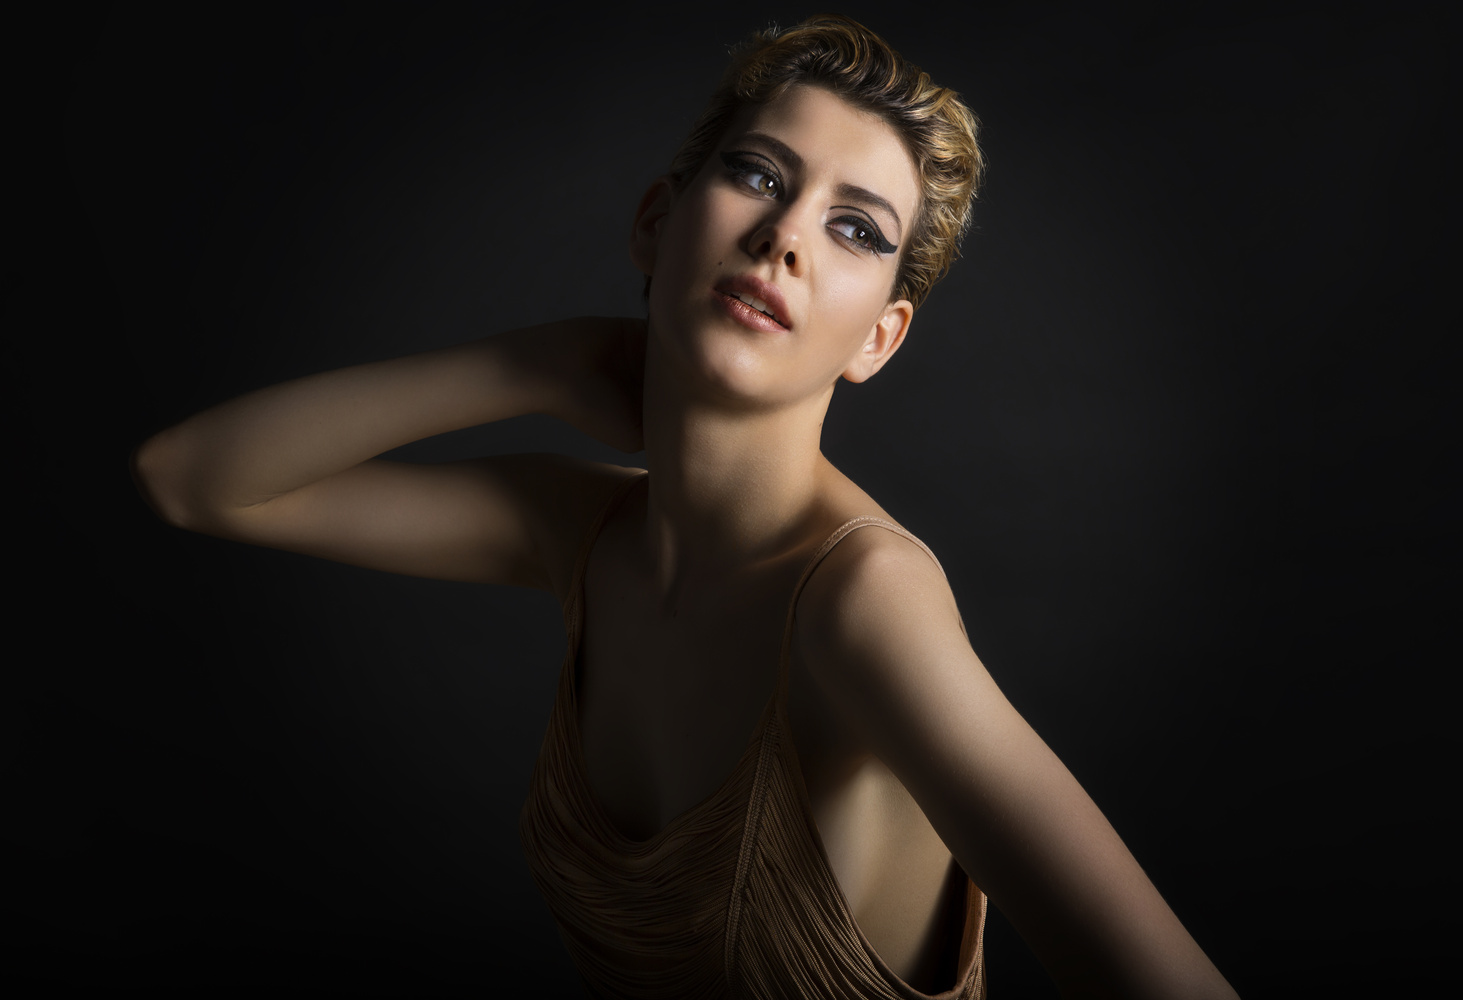 Jessica Chaimann_3 by ADITYA MISRA